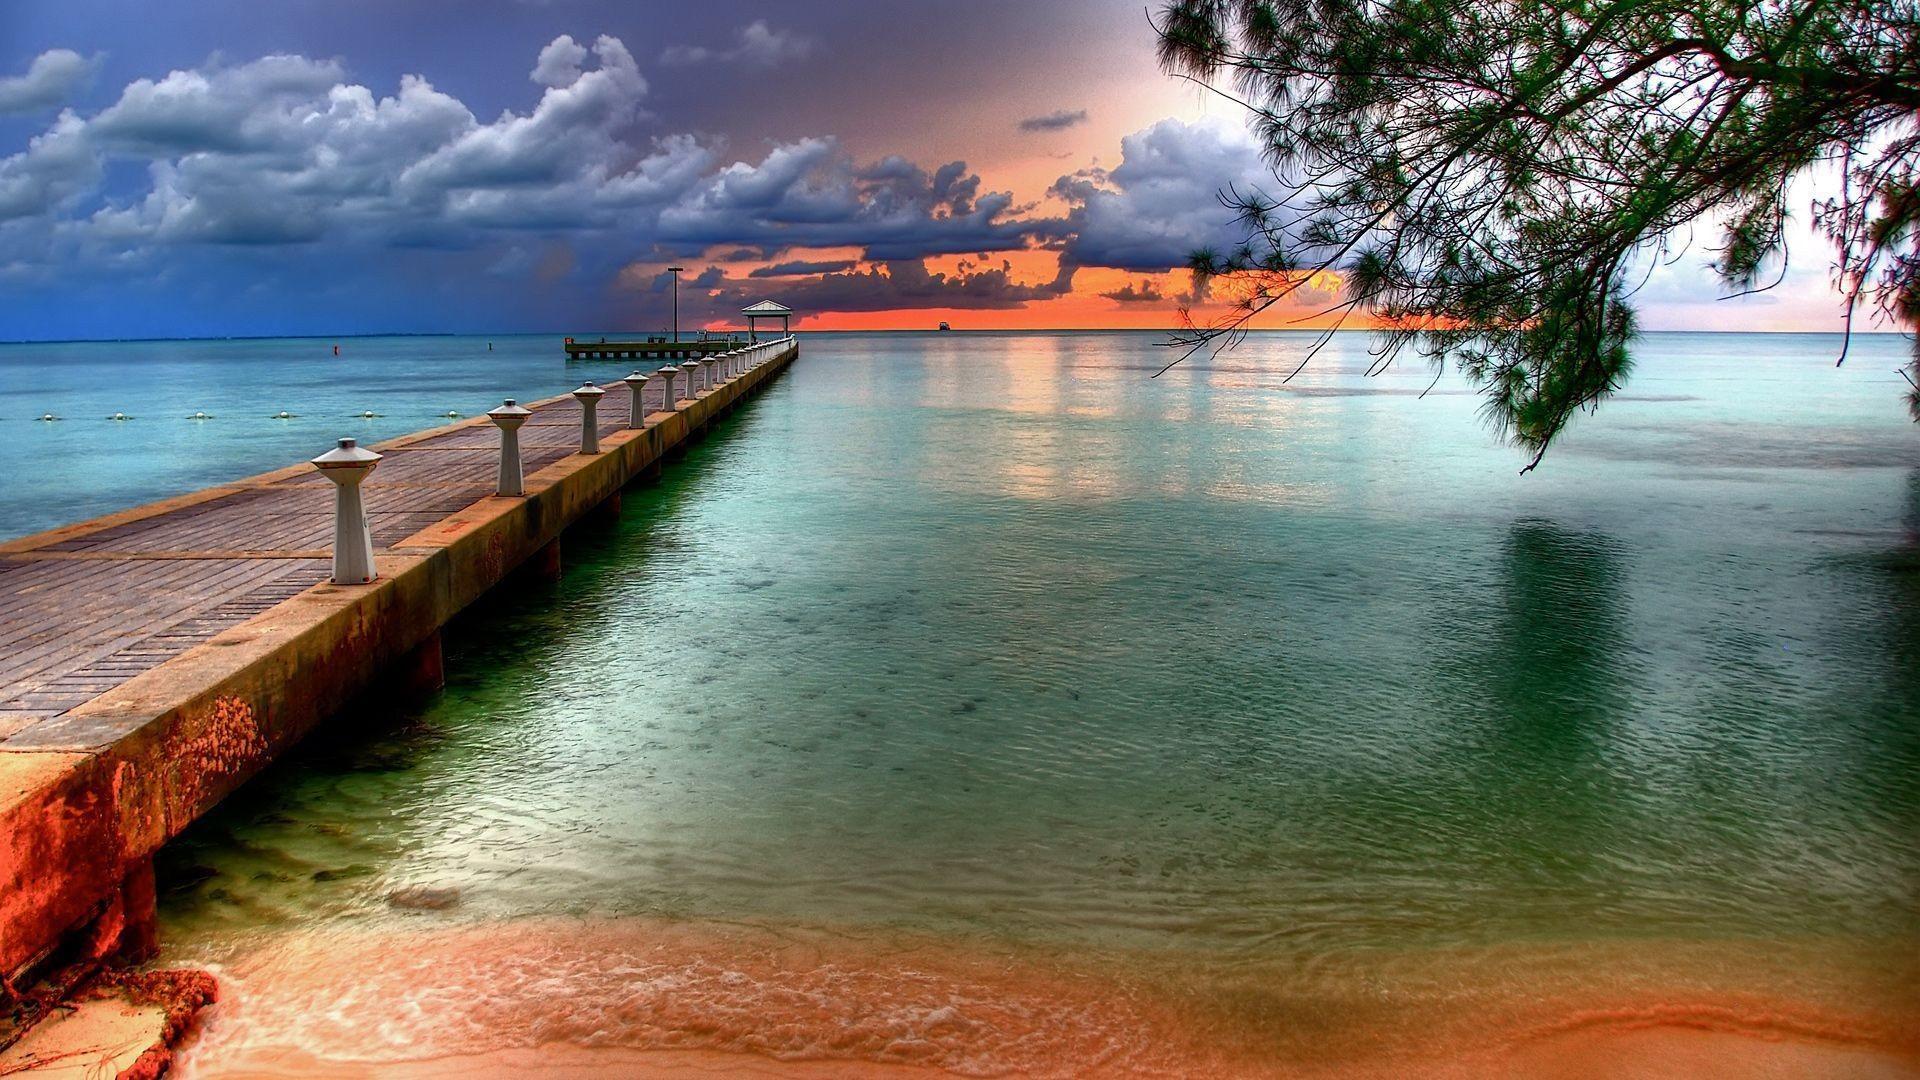 MK: Florida Keys Pictures Wallpaper, 40+ Beautiful Florida Keys .